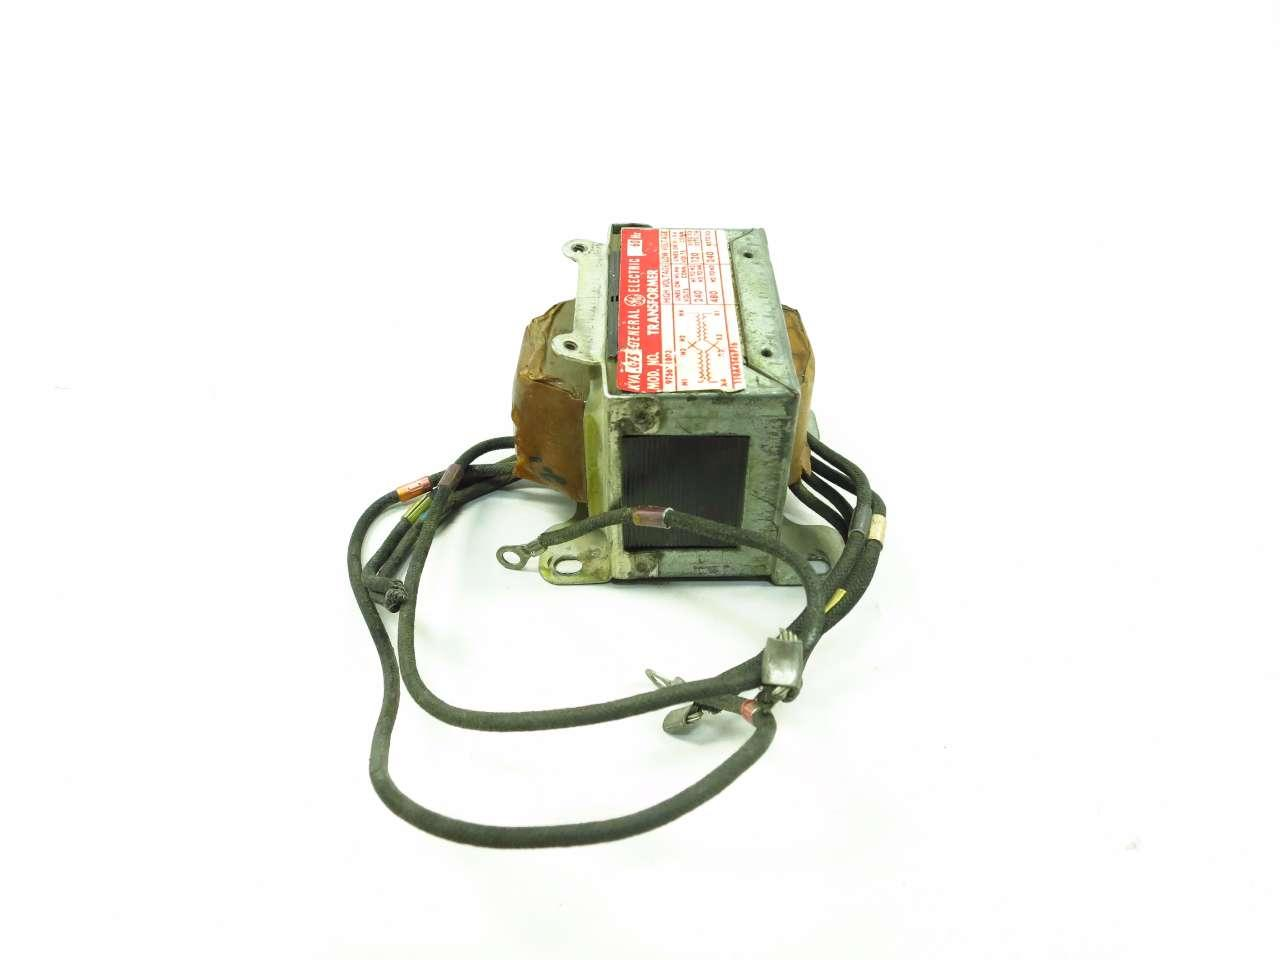 General Electric GE 9T56Y1803 1PH 75VA 240//480V-AC 120//240V-AC Transformer